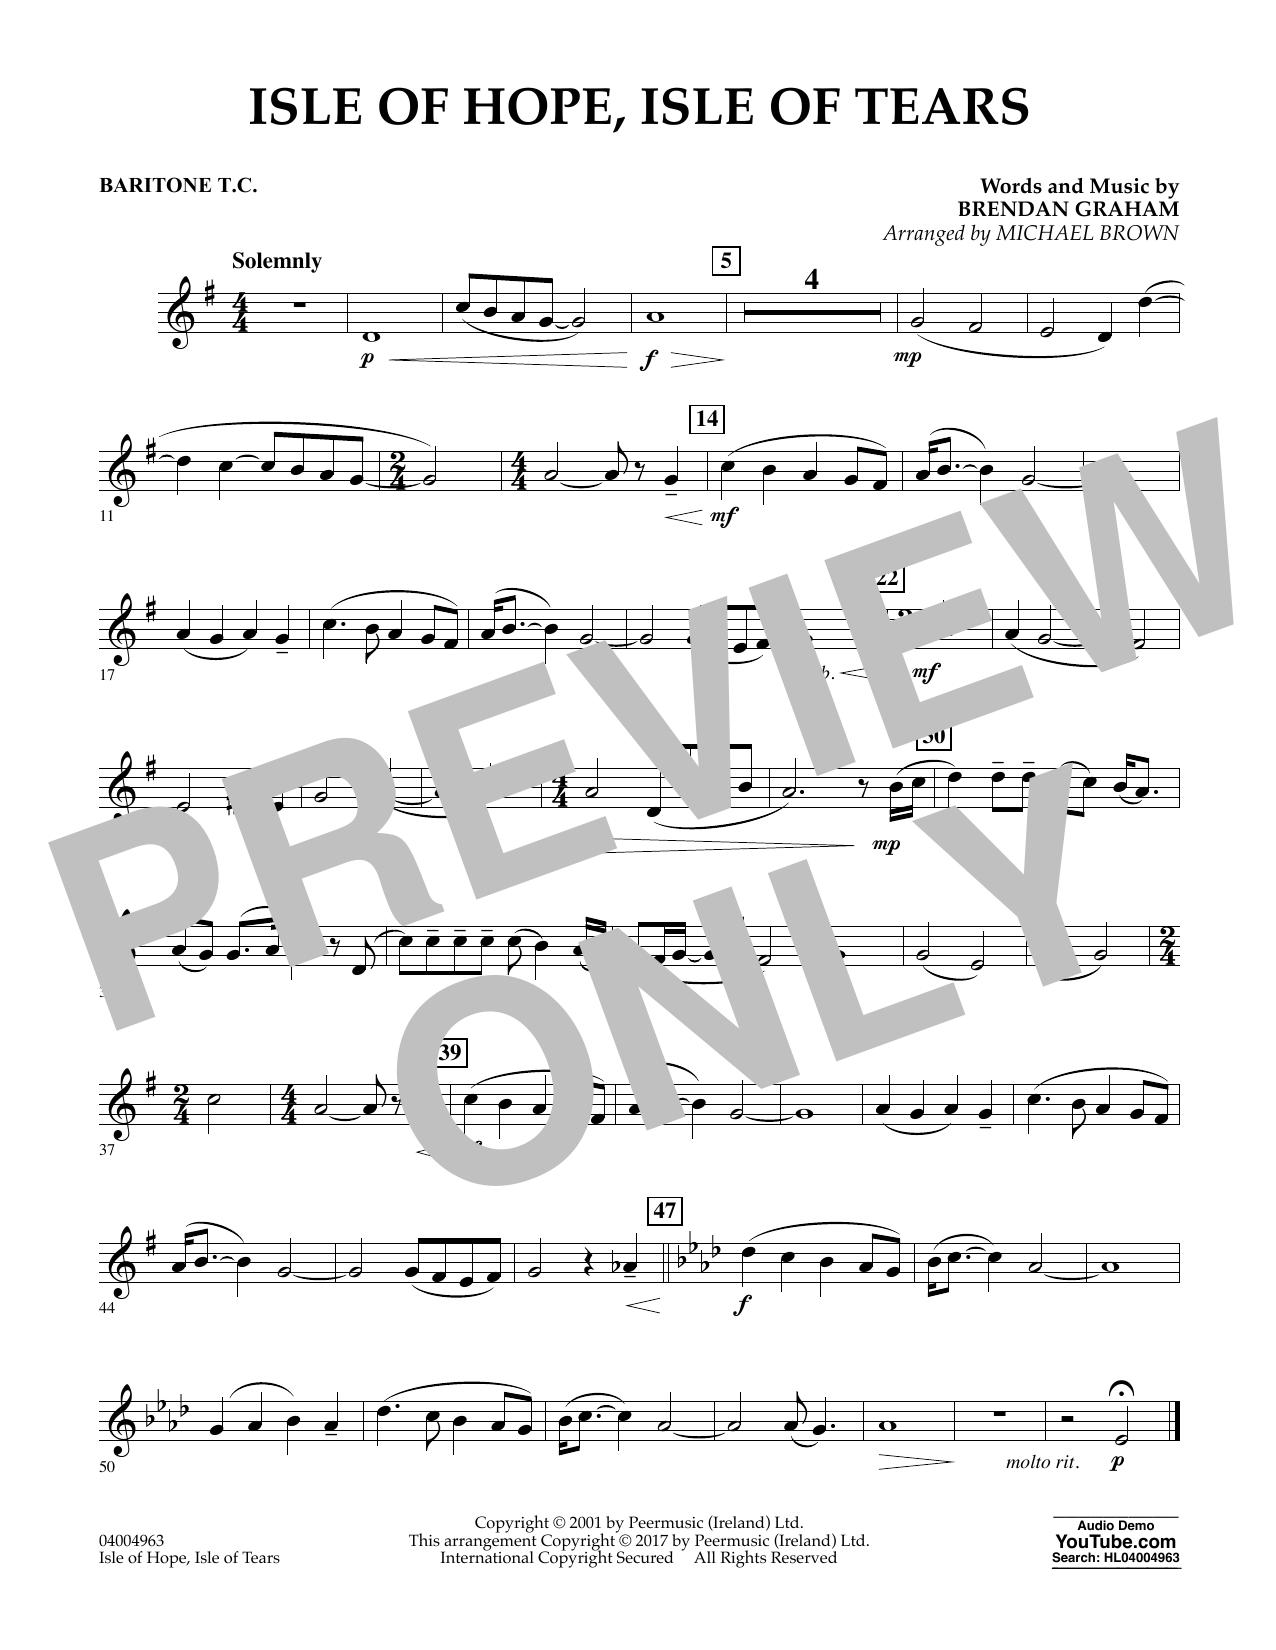 Isle of Hope, Isle of Tears - Baritone T.C. Sheet Music